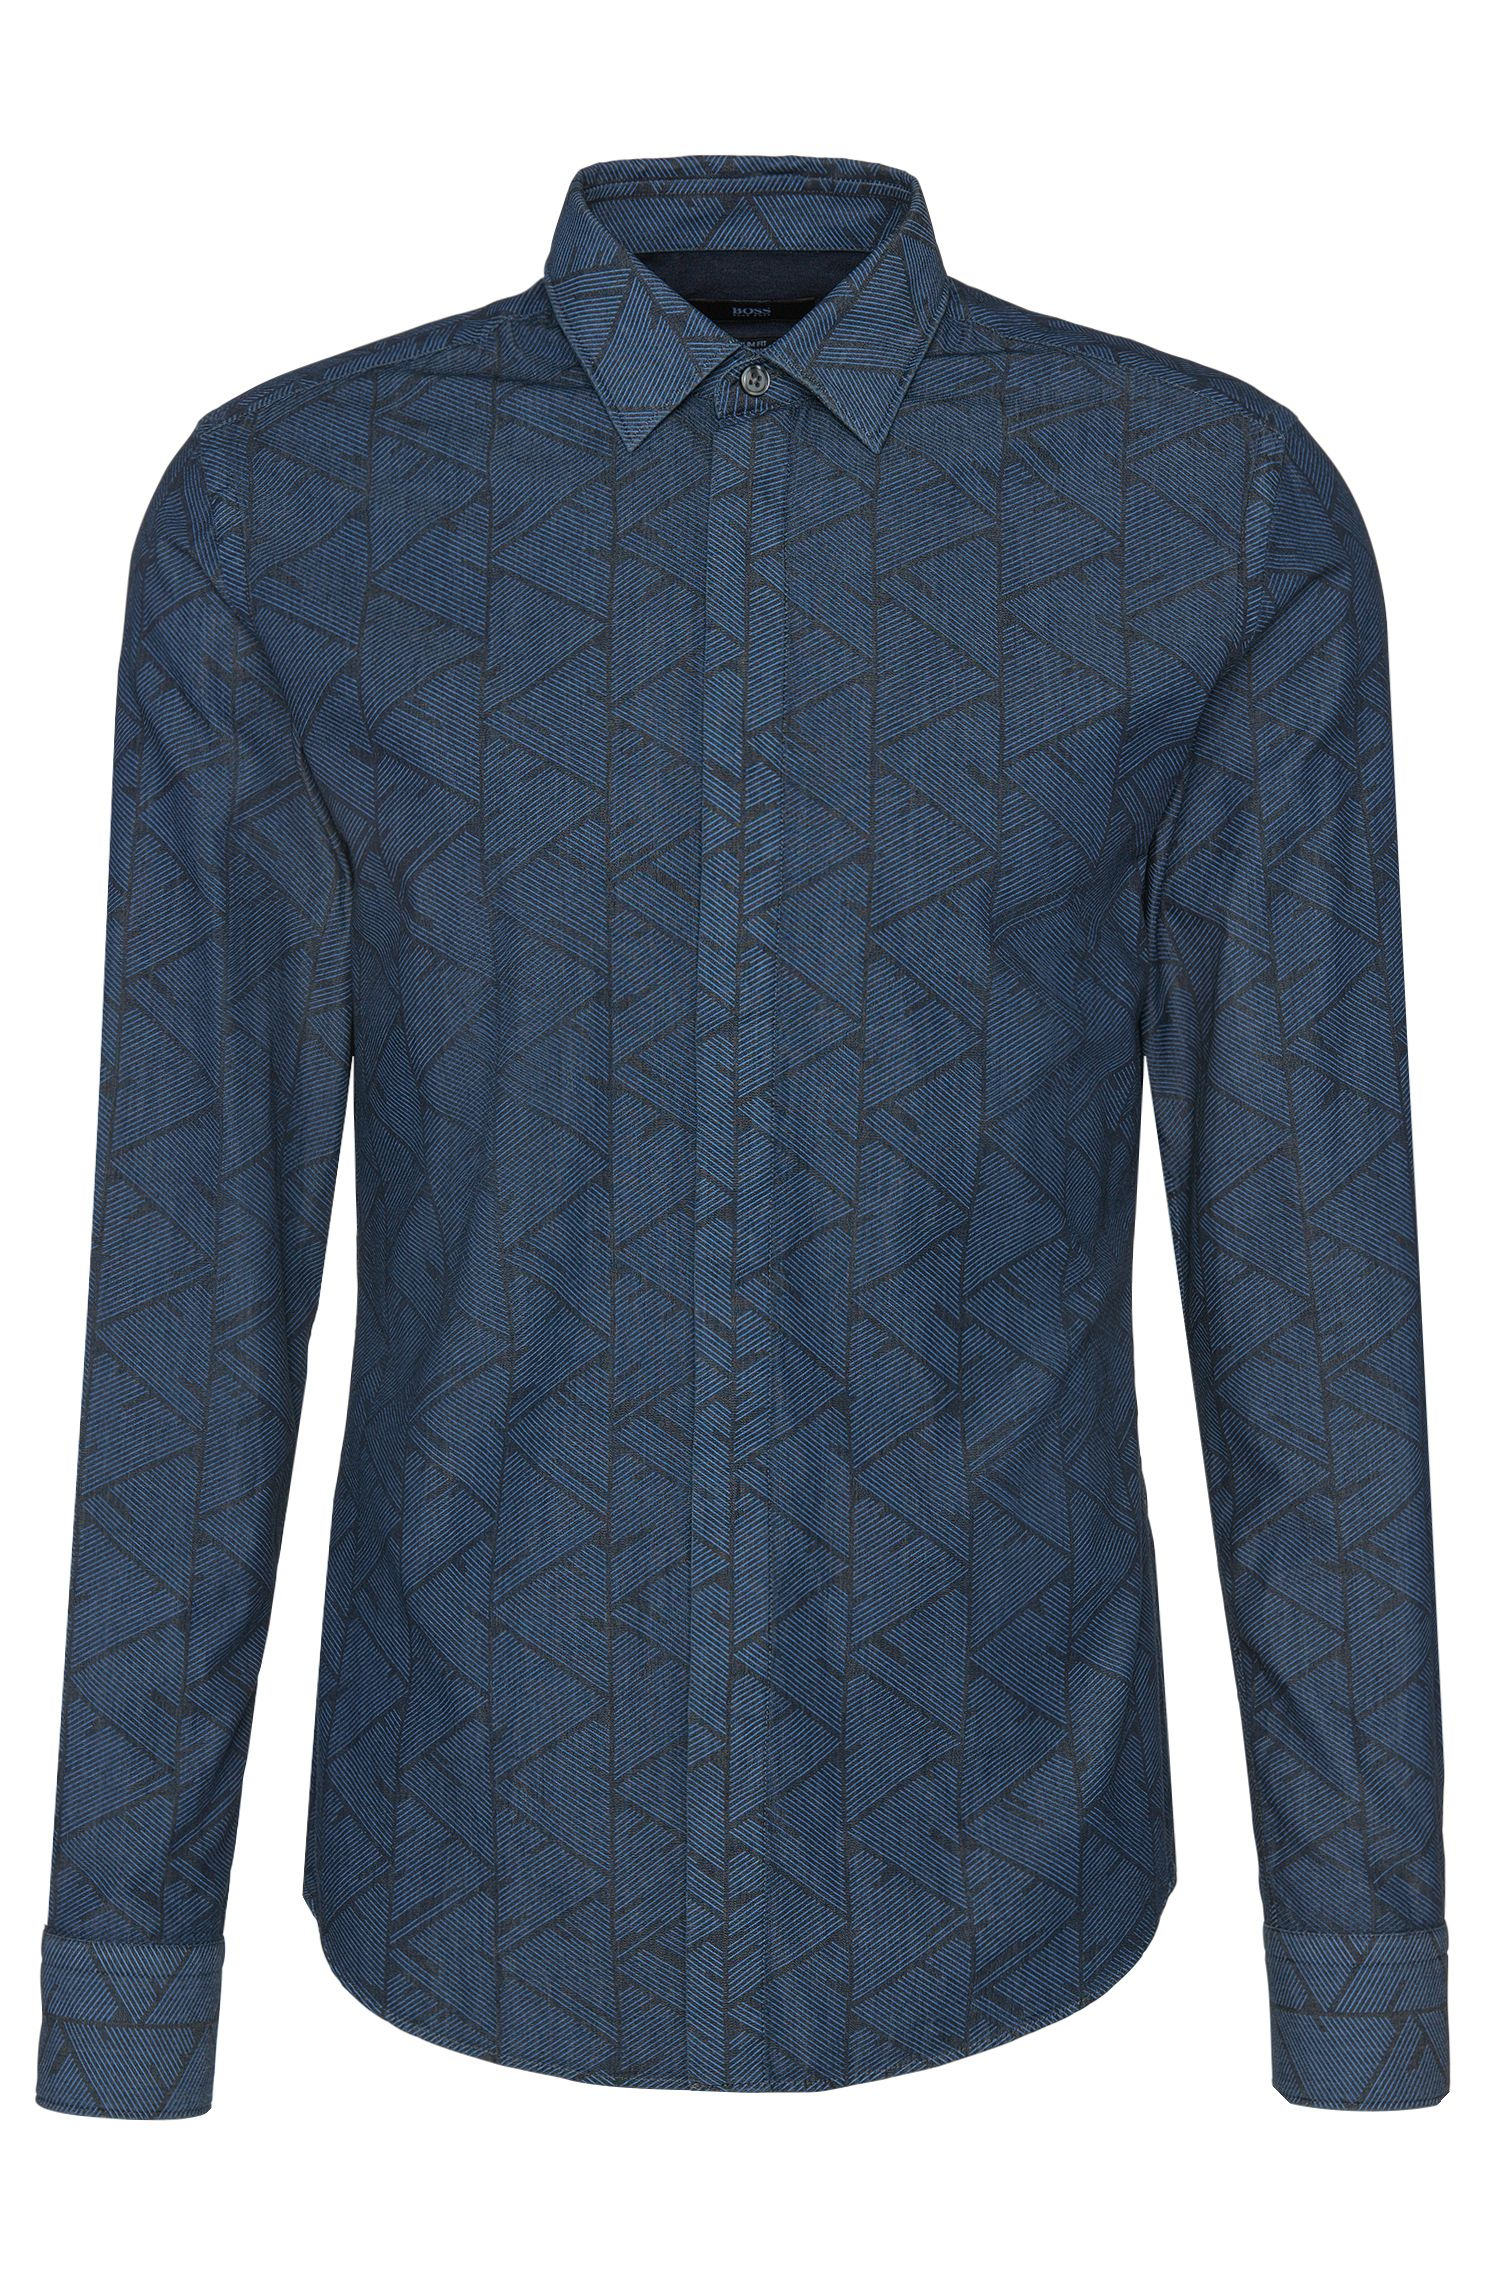 'Reid'   Slim Fit, Italian Cotton Abstract Button Down Shirt